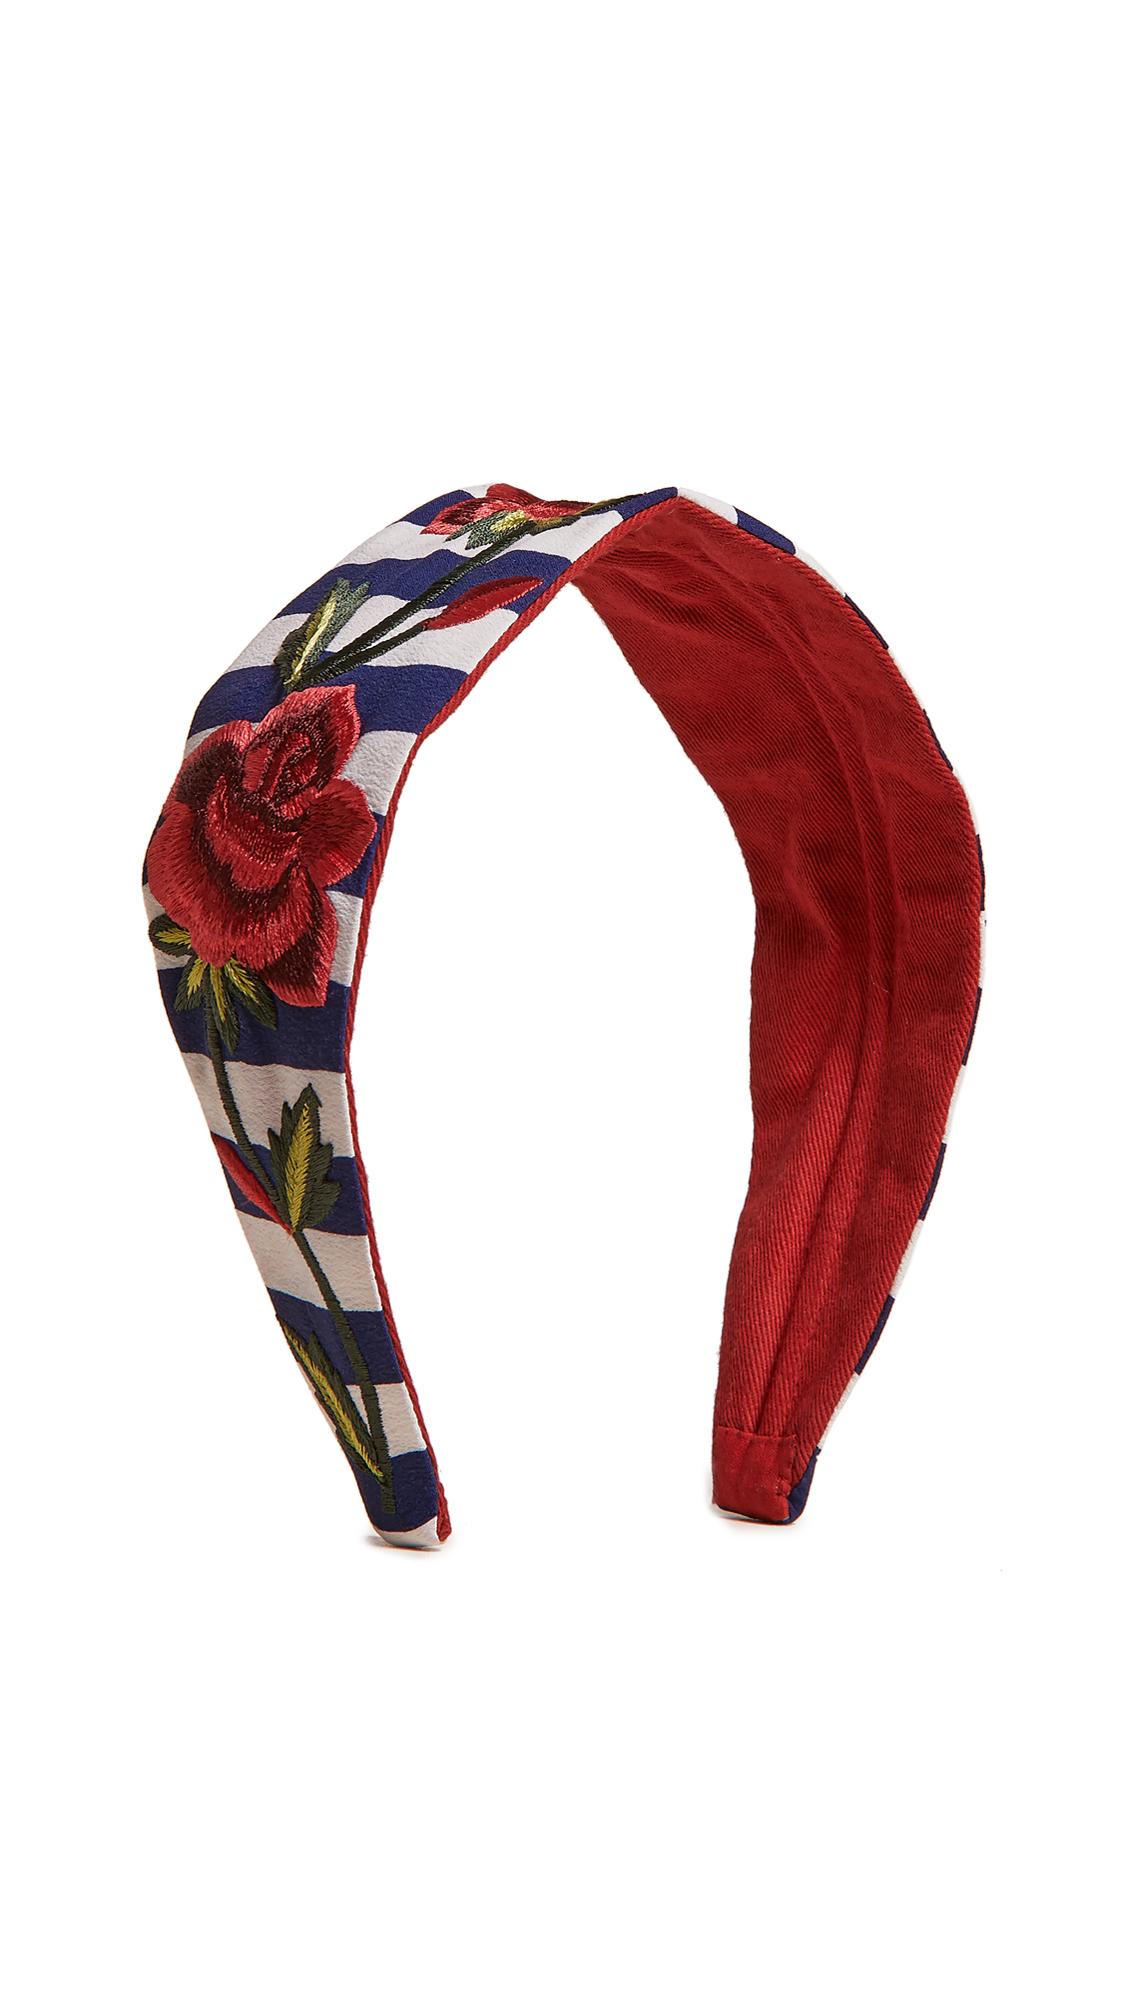 NAMJOSH Striped Rose Headband